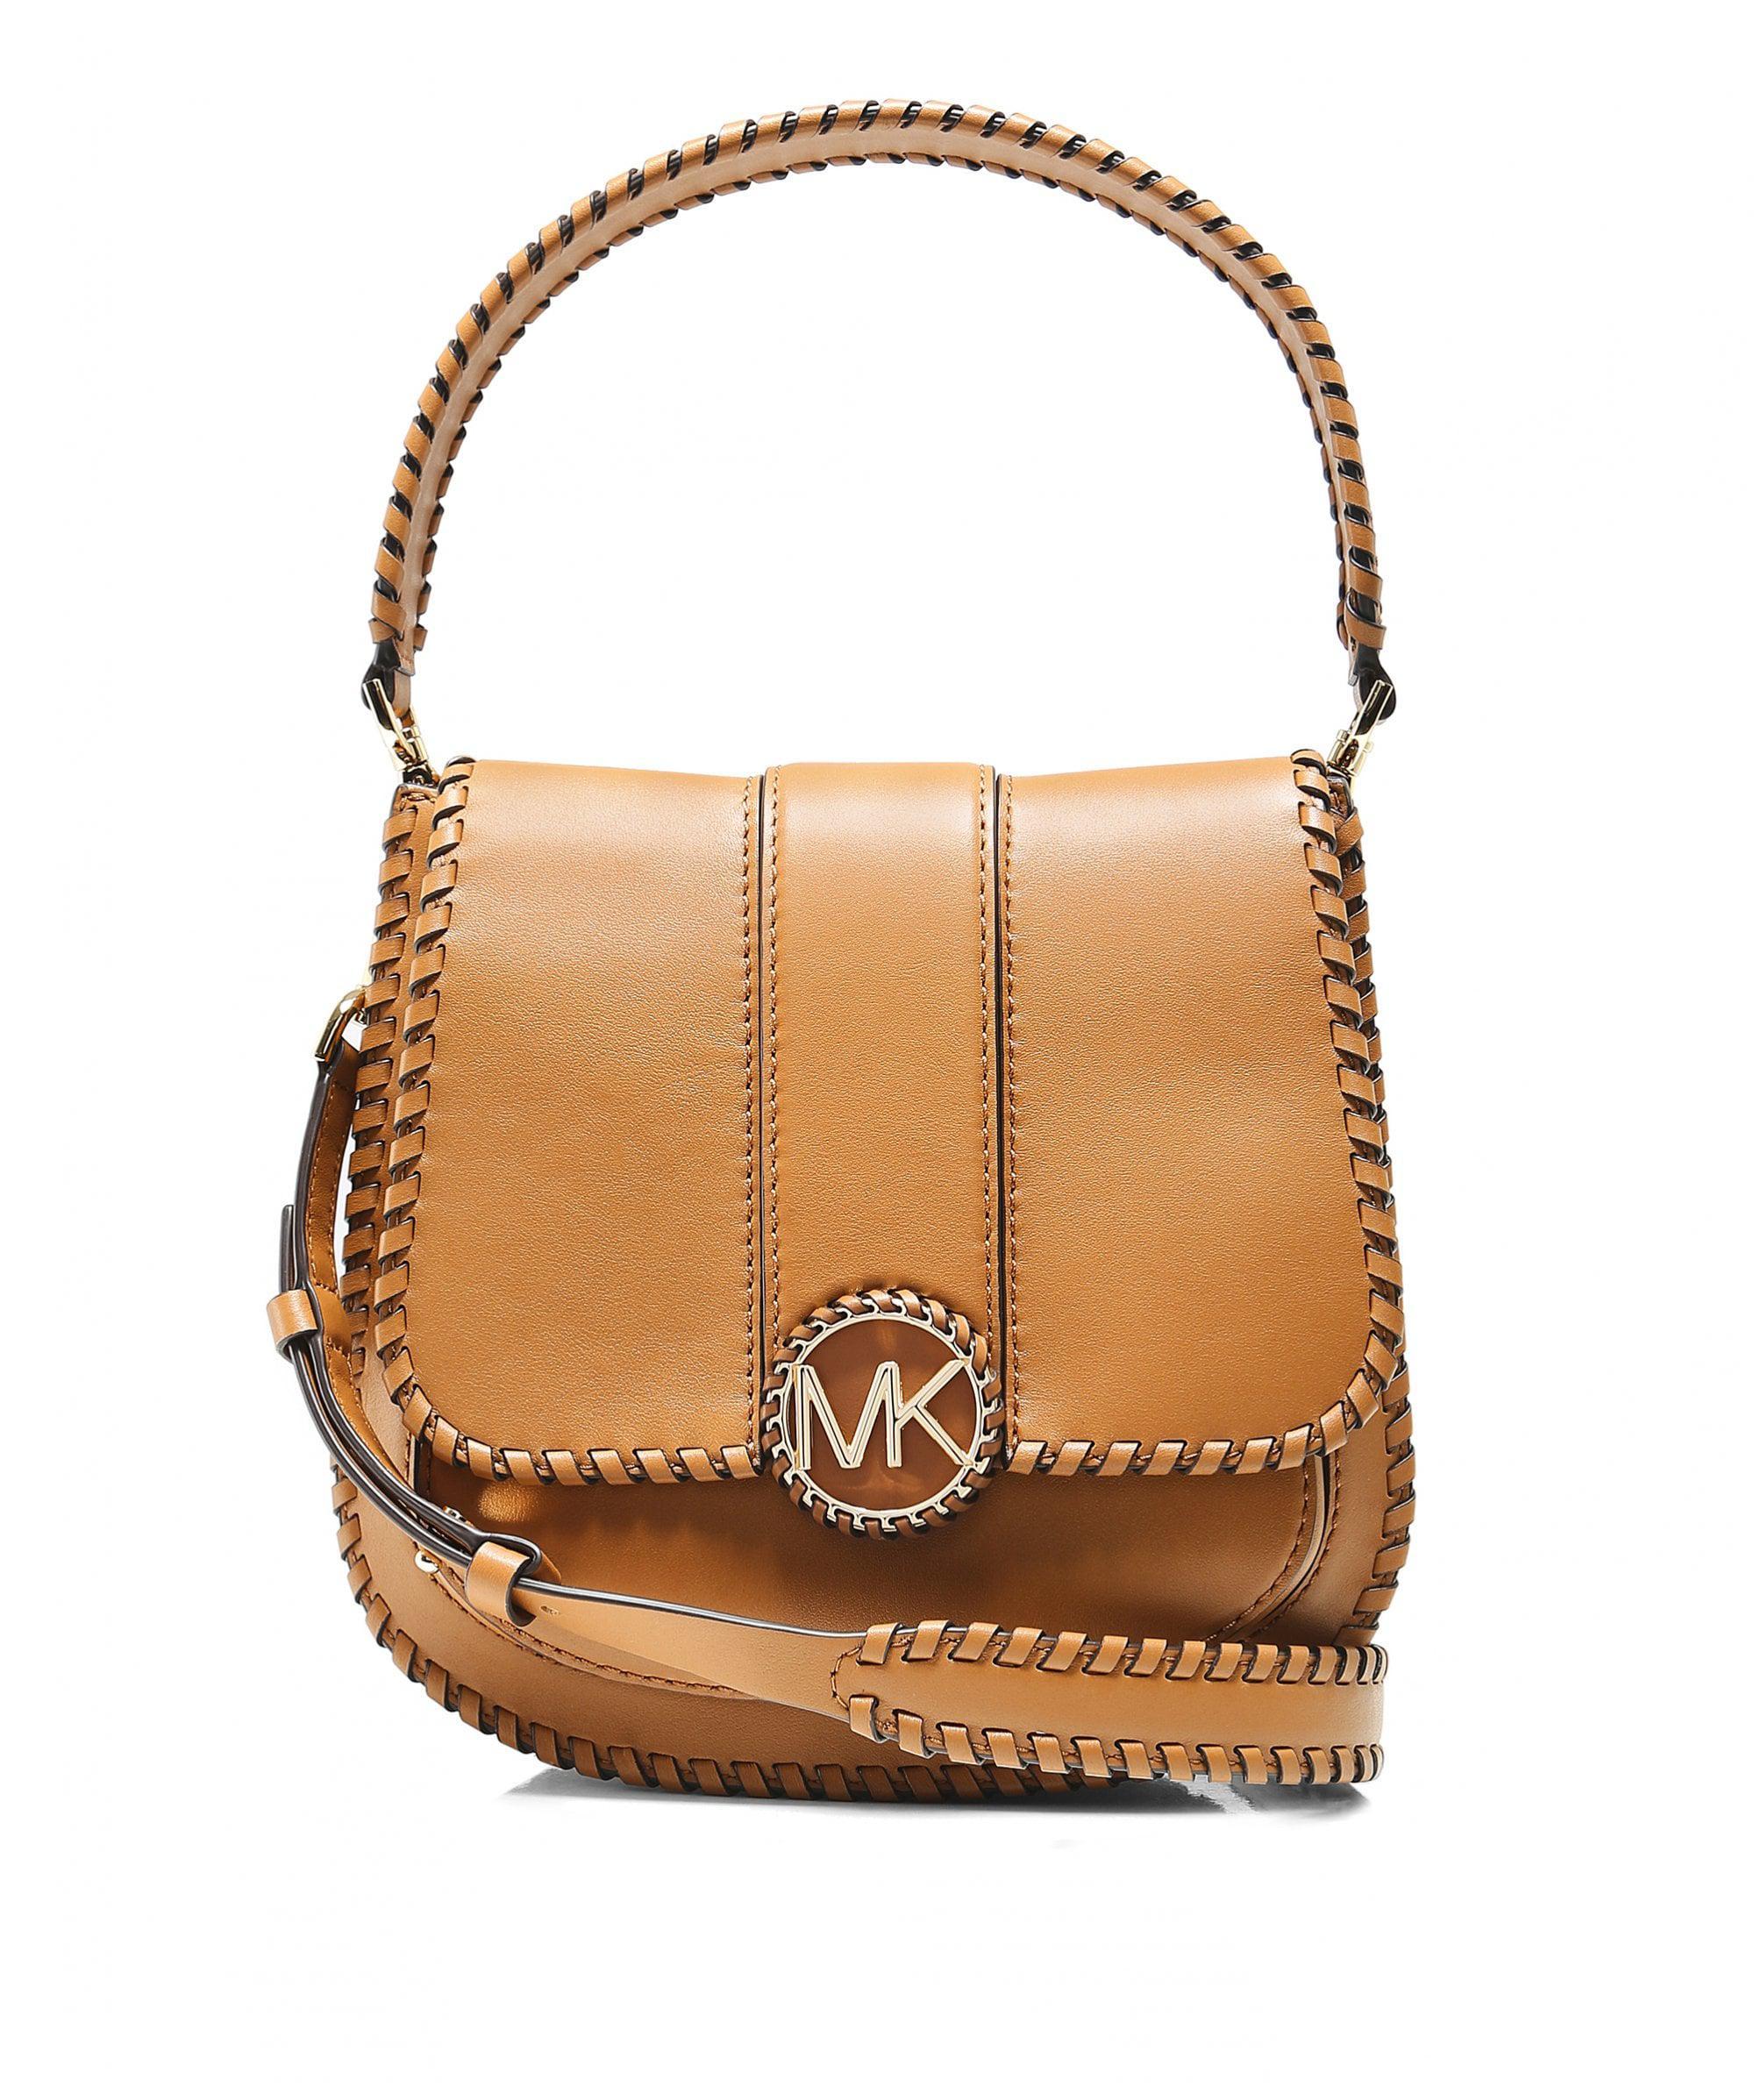 755e90358efb MICHAEL Michael Kors Lillie Medium Leather Shoulder Bag in Brown - Lyst